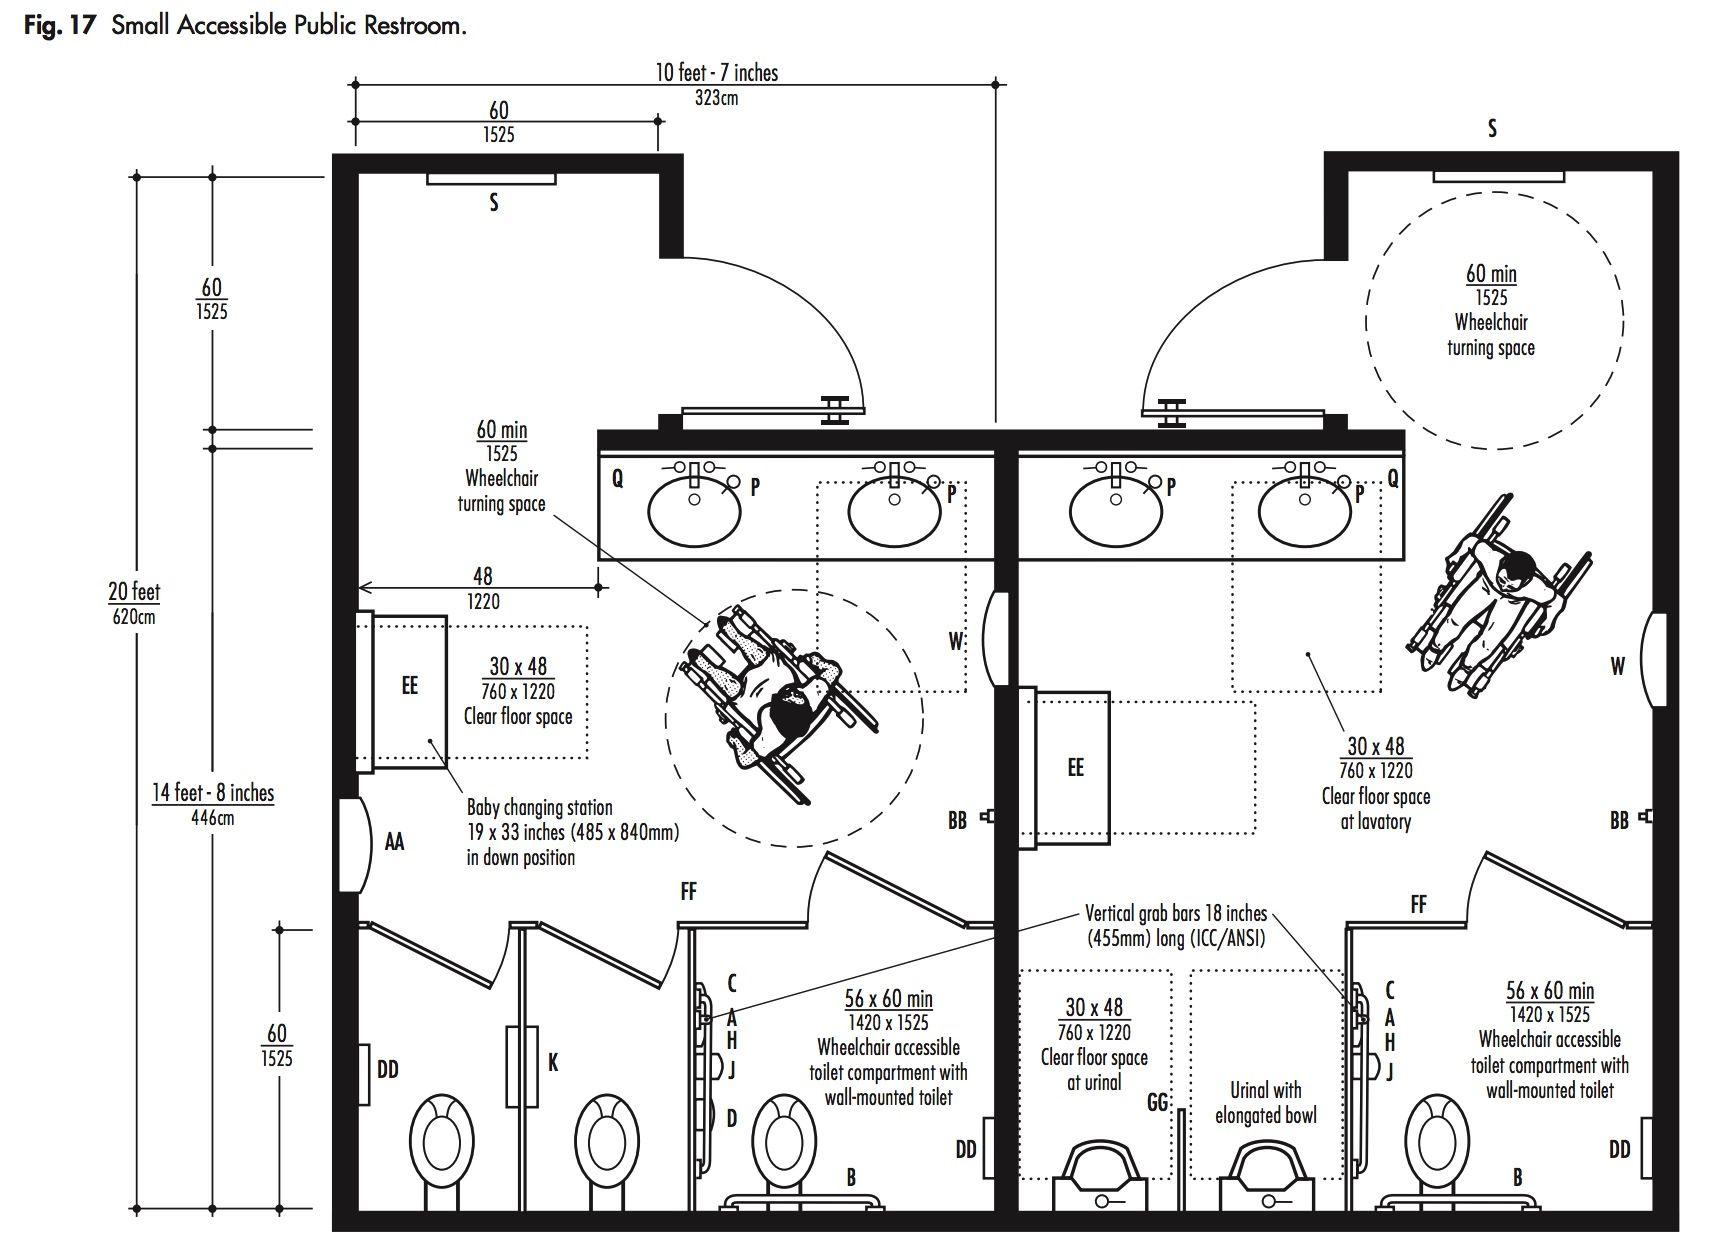 Typical Restroom Diagram